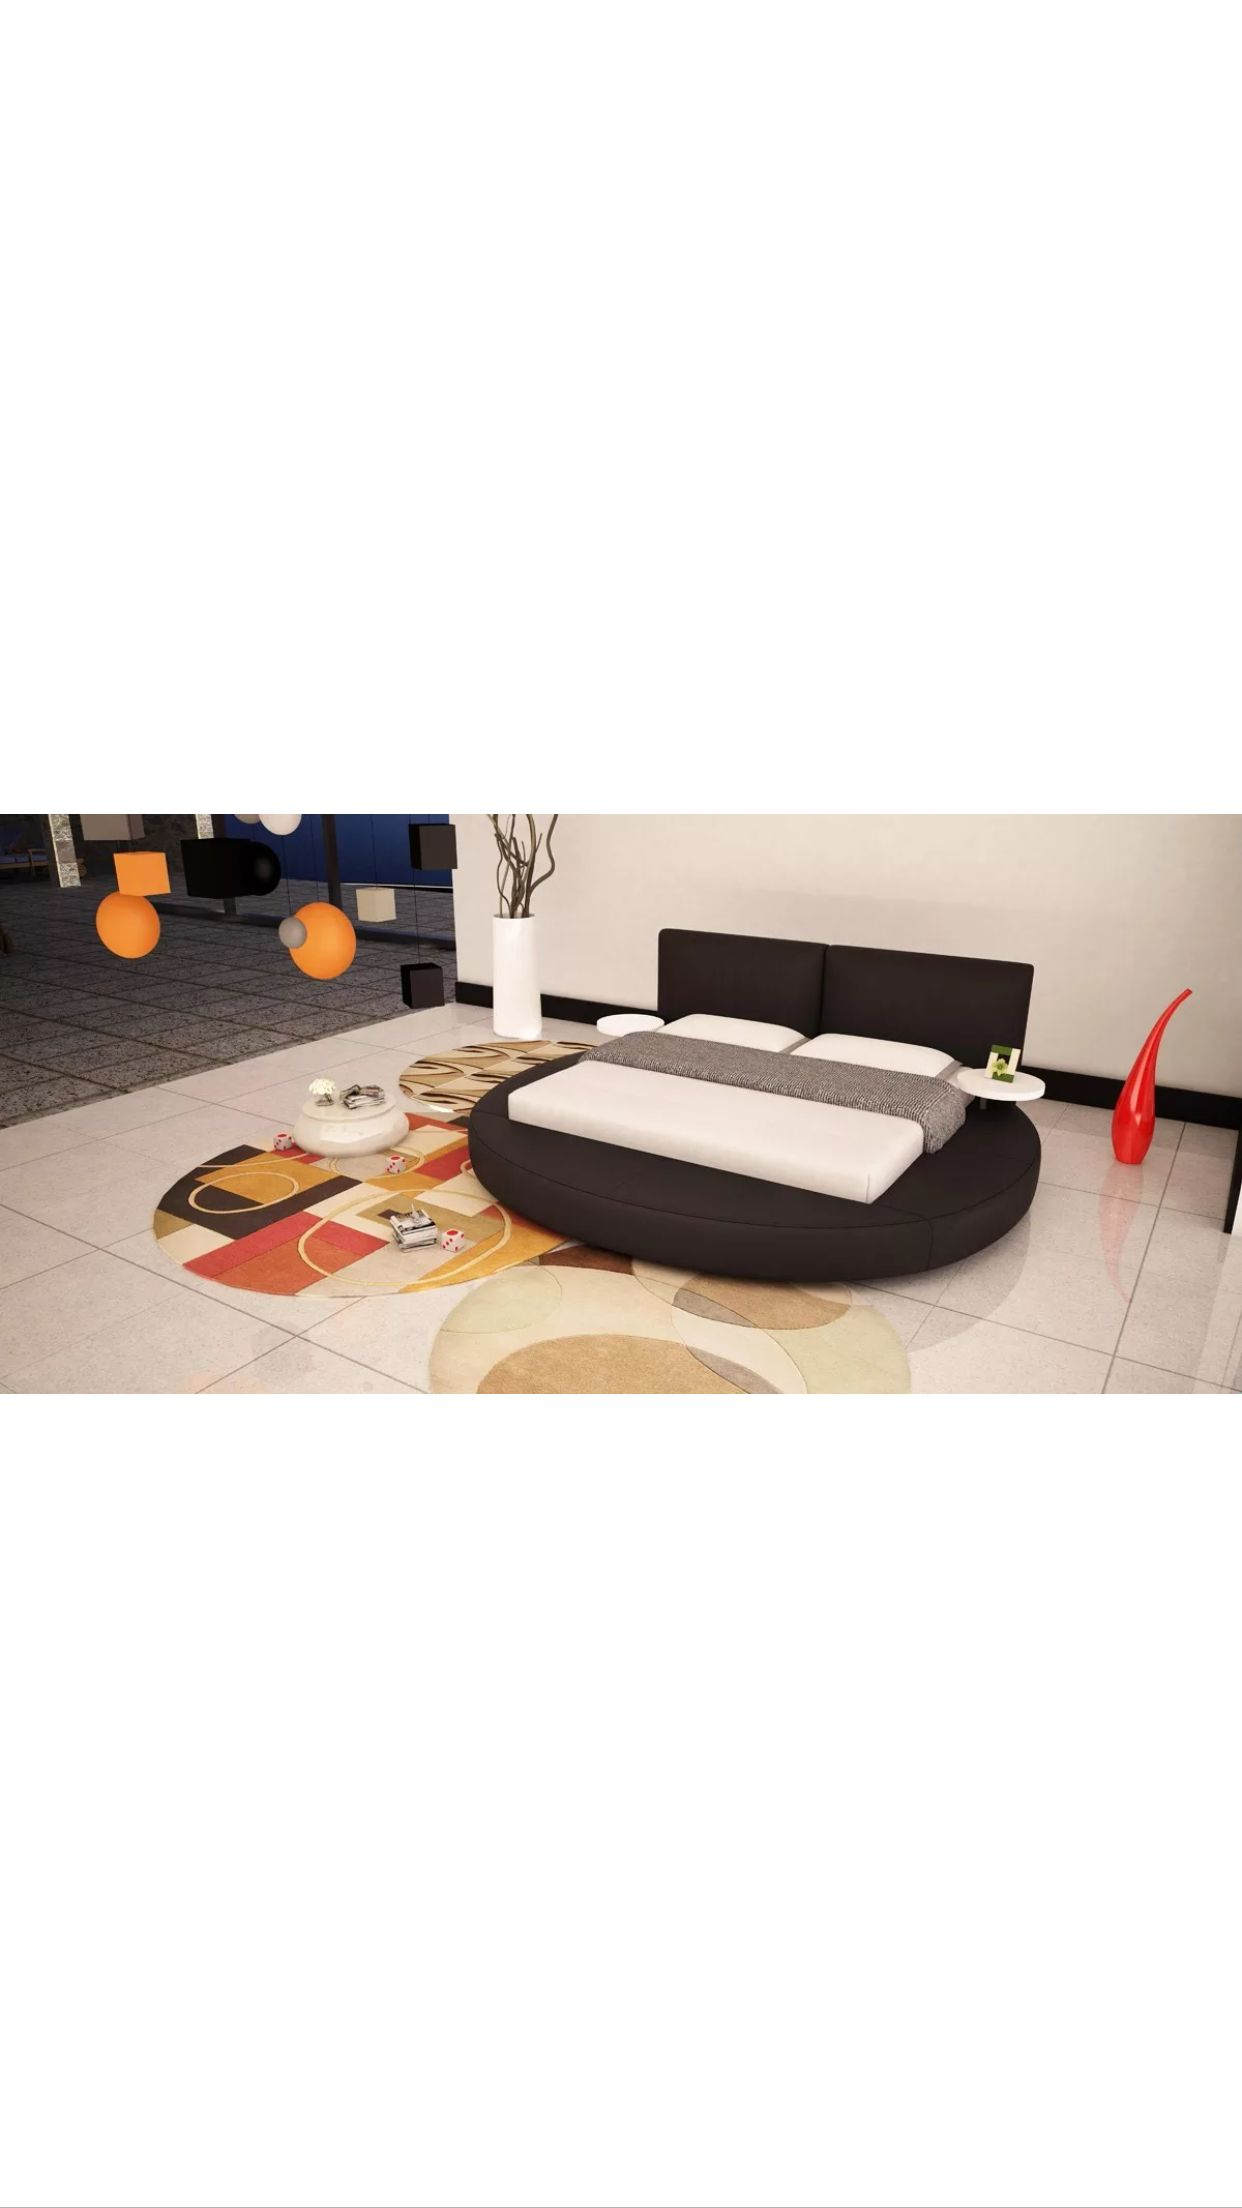 Rotondo Modern Eco Leather Round Bed w LED Lights